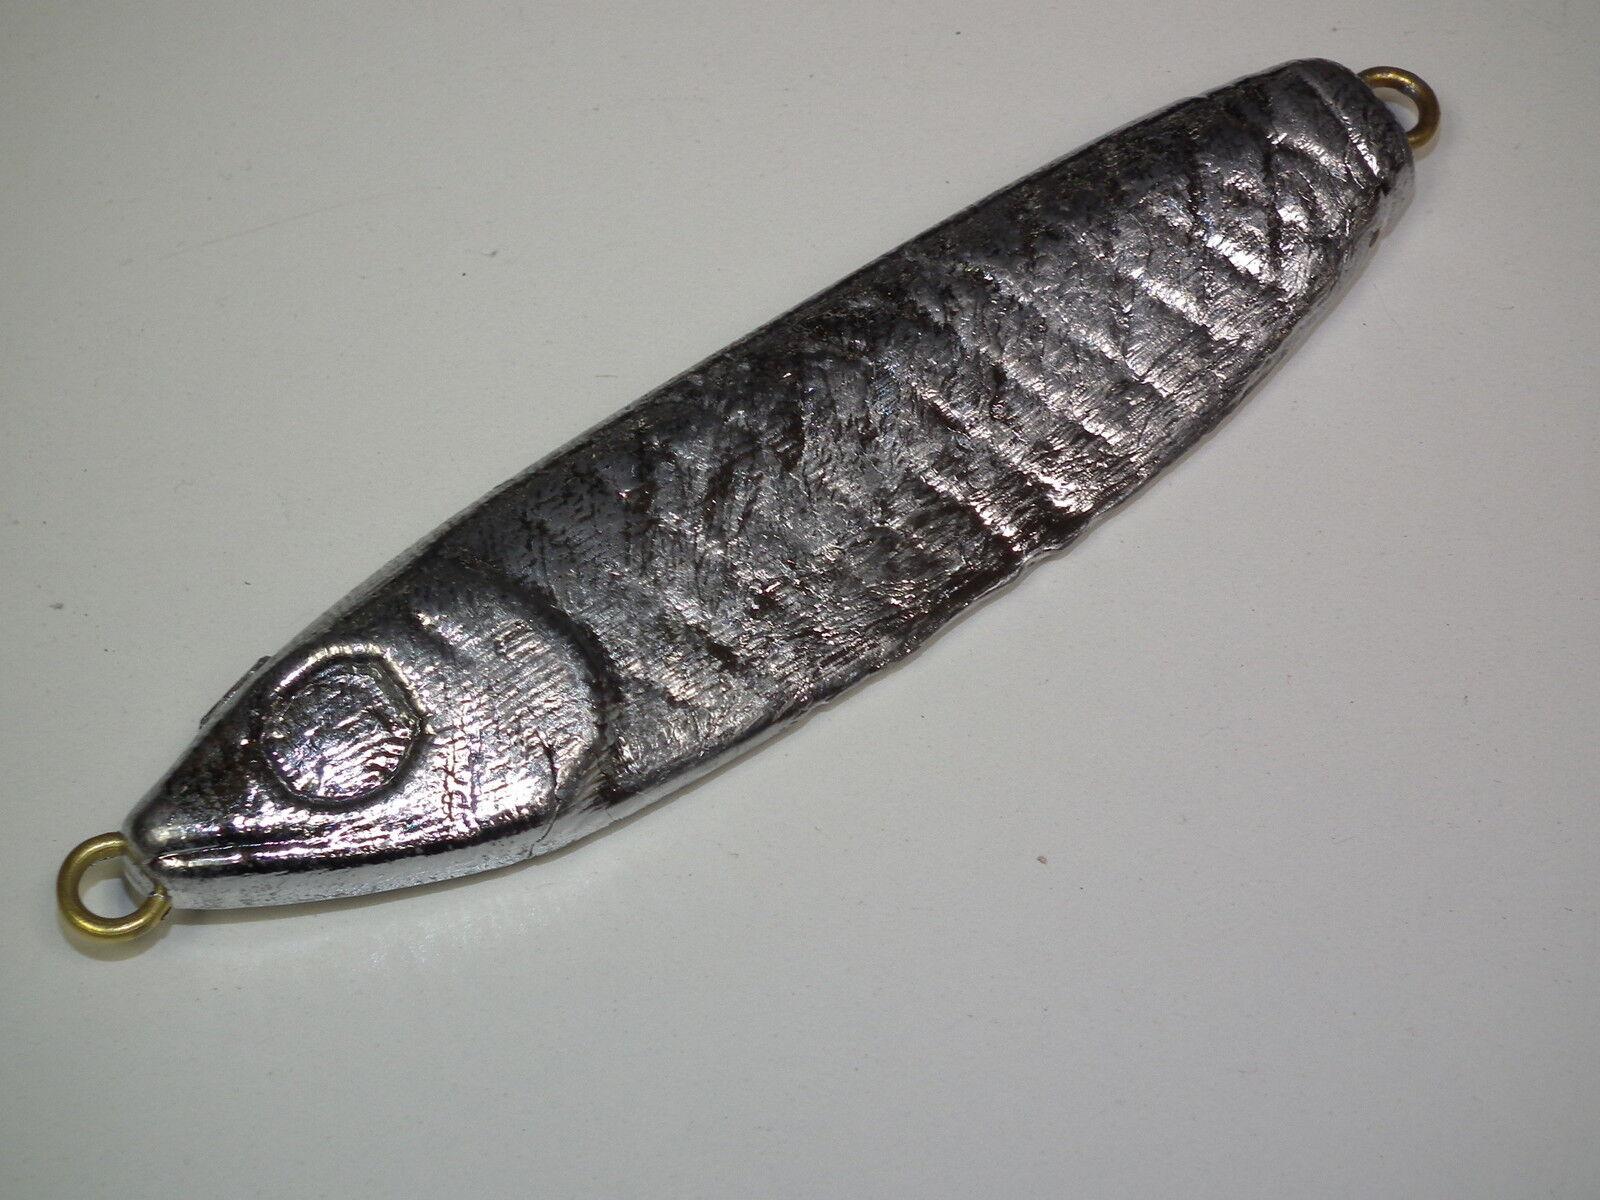 Plantilla Plantilla Plantilla de pescado de mar Bamboleo Molde 12,16,20oz CNC Aluminio Arenque d03529